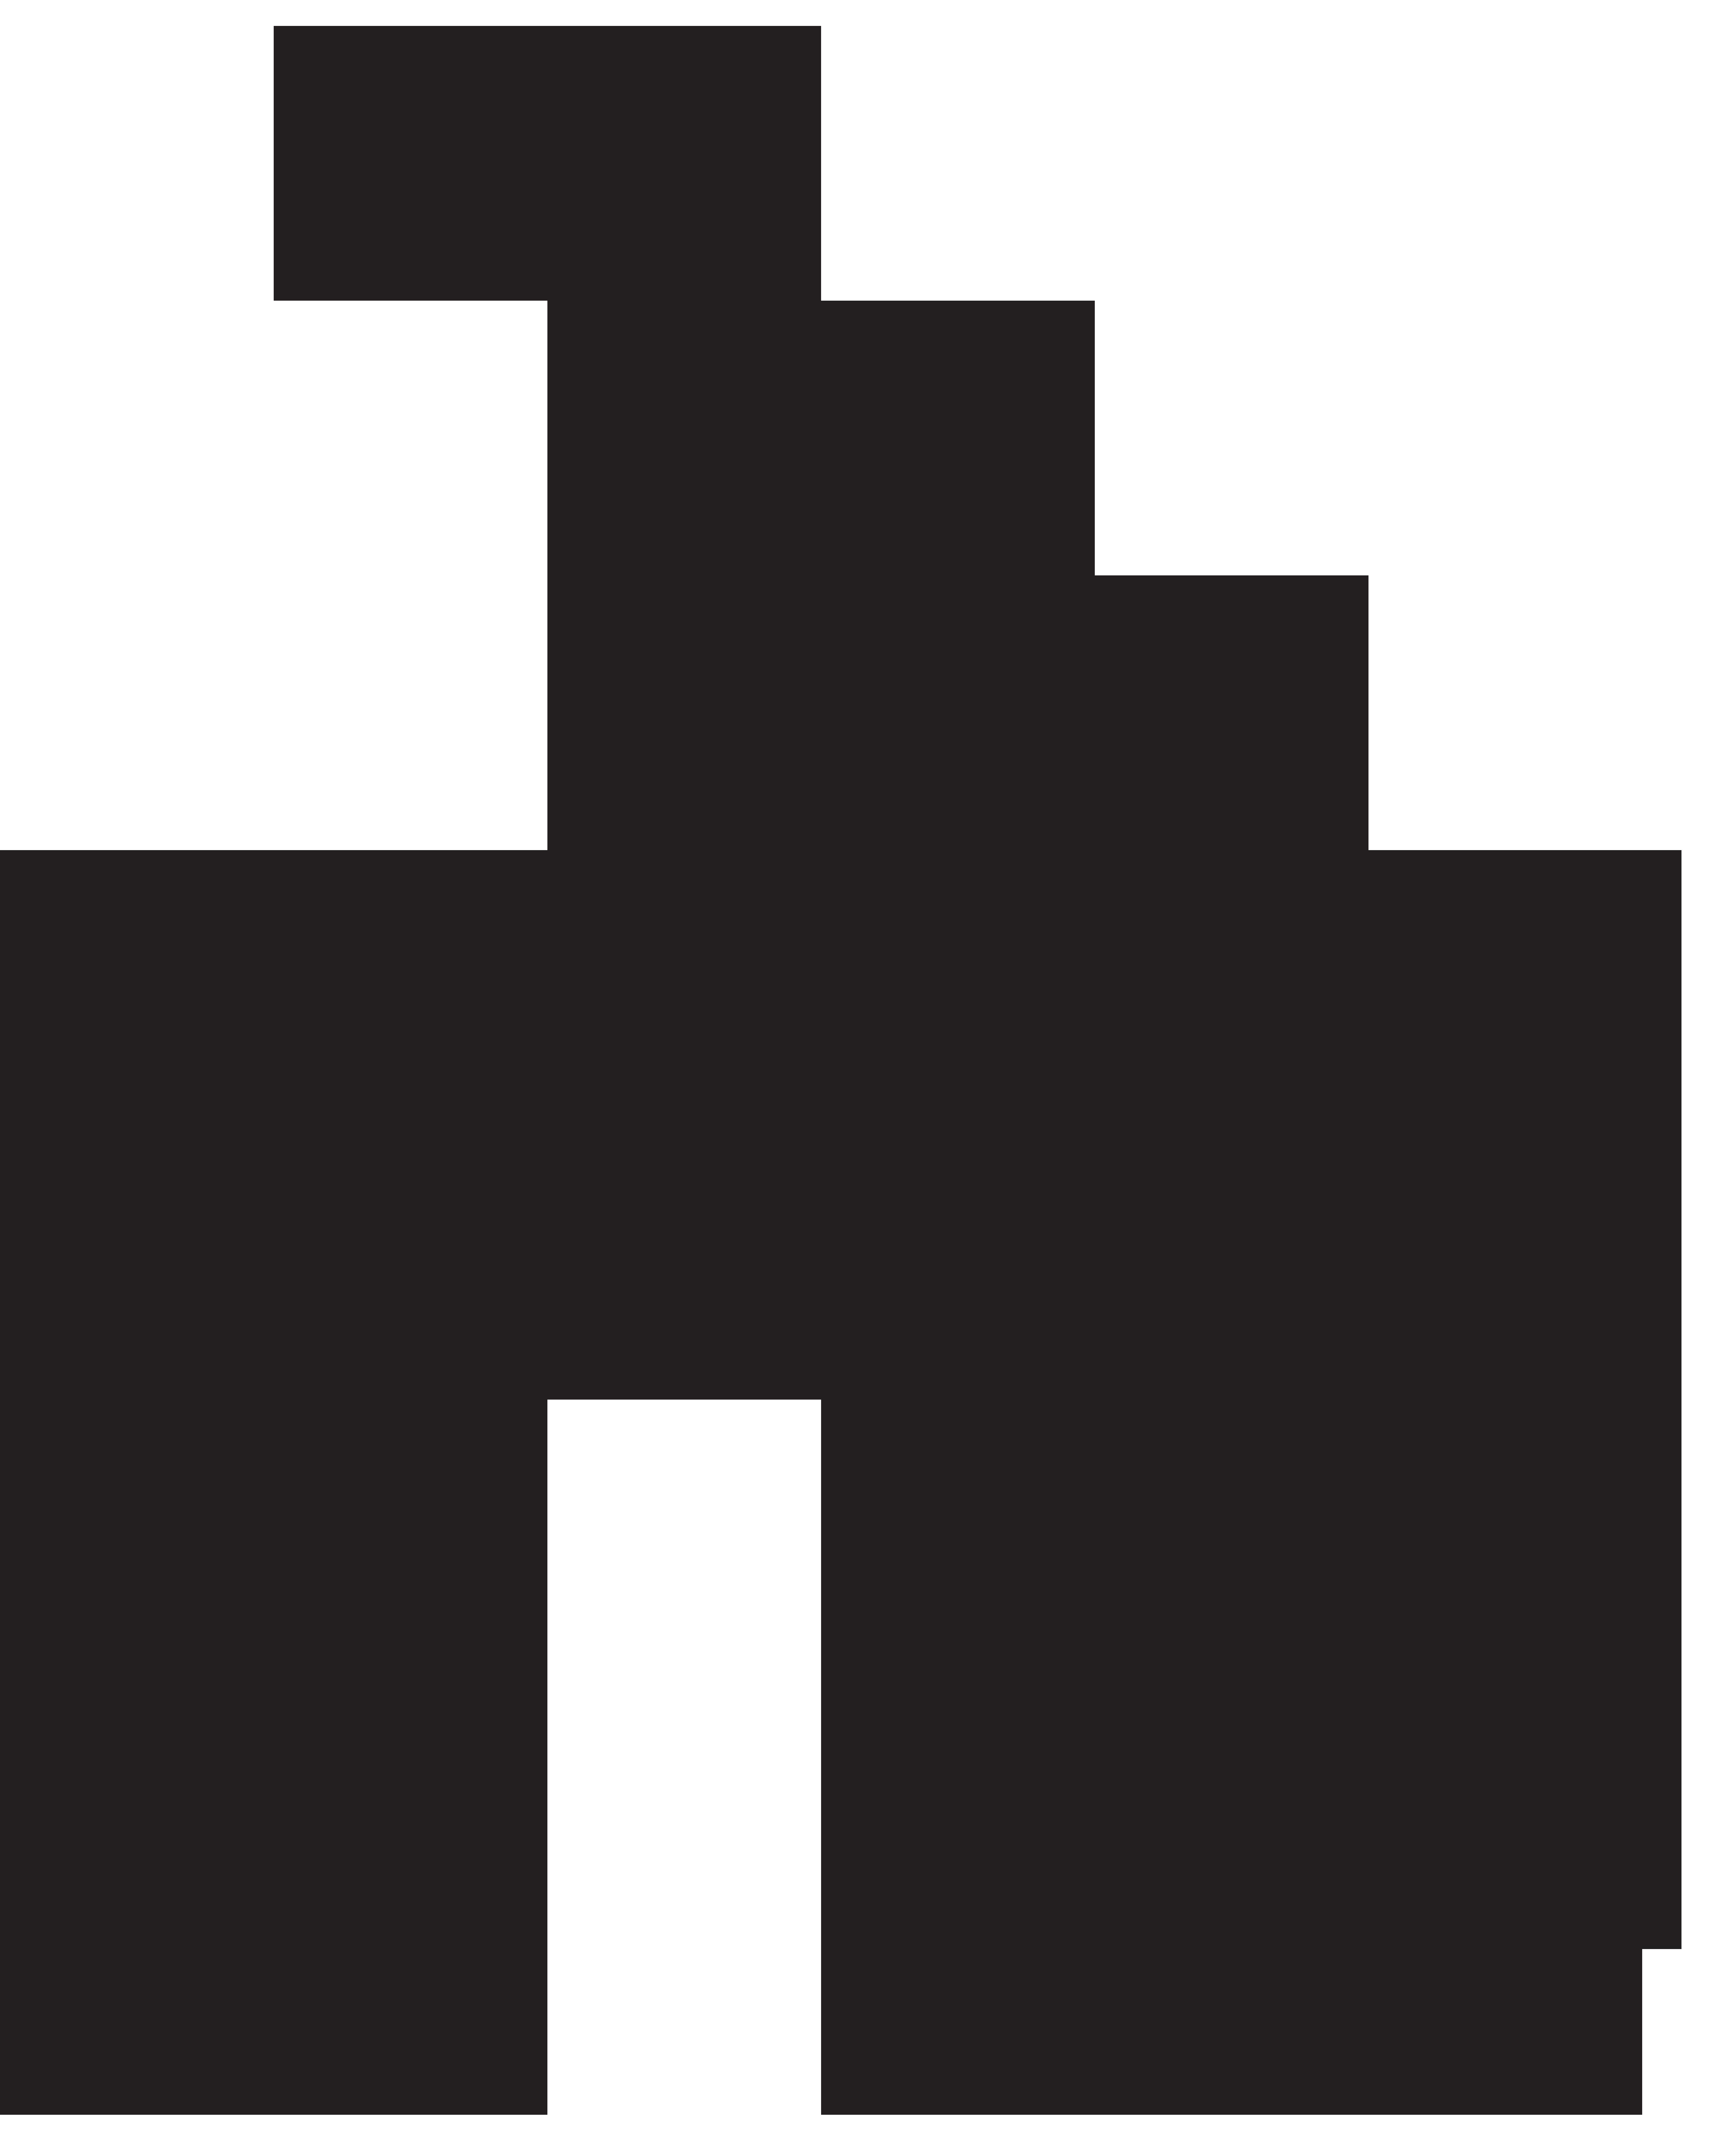 Watermelon clipart silhouette. Giraffes png clip art